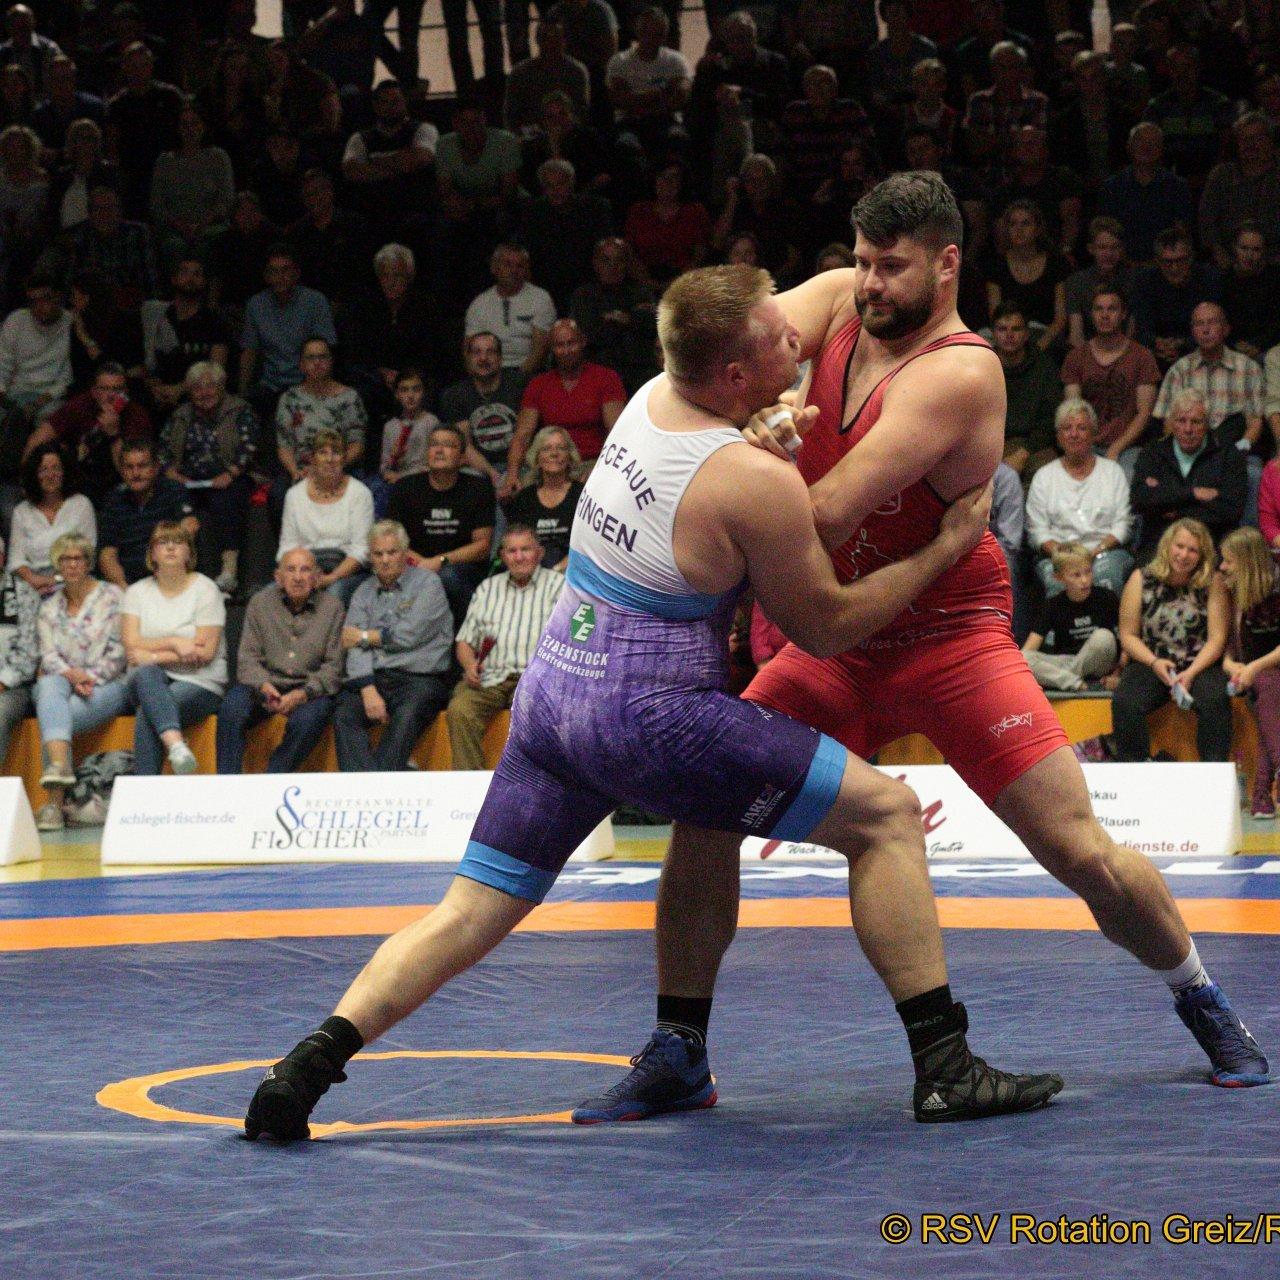 130kg Greco Alin Alexuc-Ciurariu EU (5) (rotes Trikot), RSV Rotation Greiz gegen Christian John (3), FC Erzgebirge Aue 2:0/PS/7:3/06:00